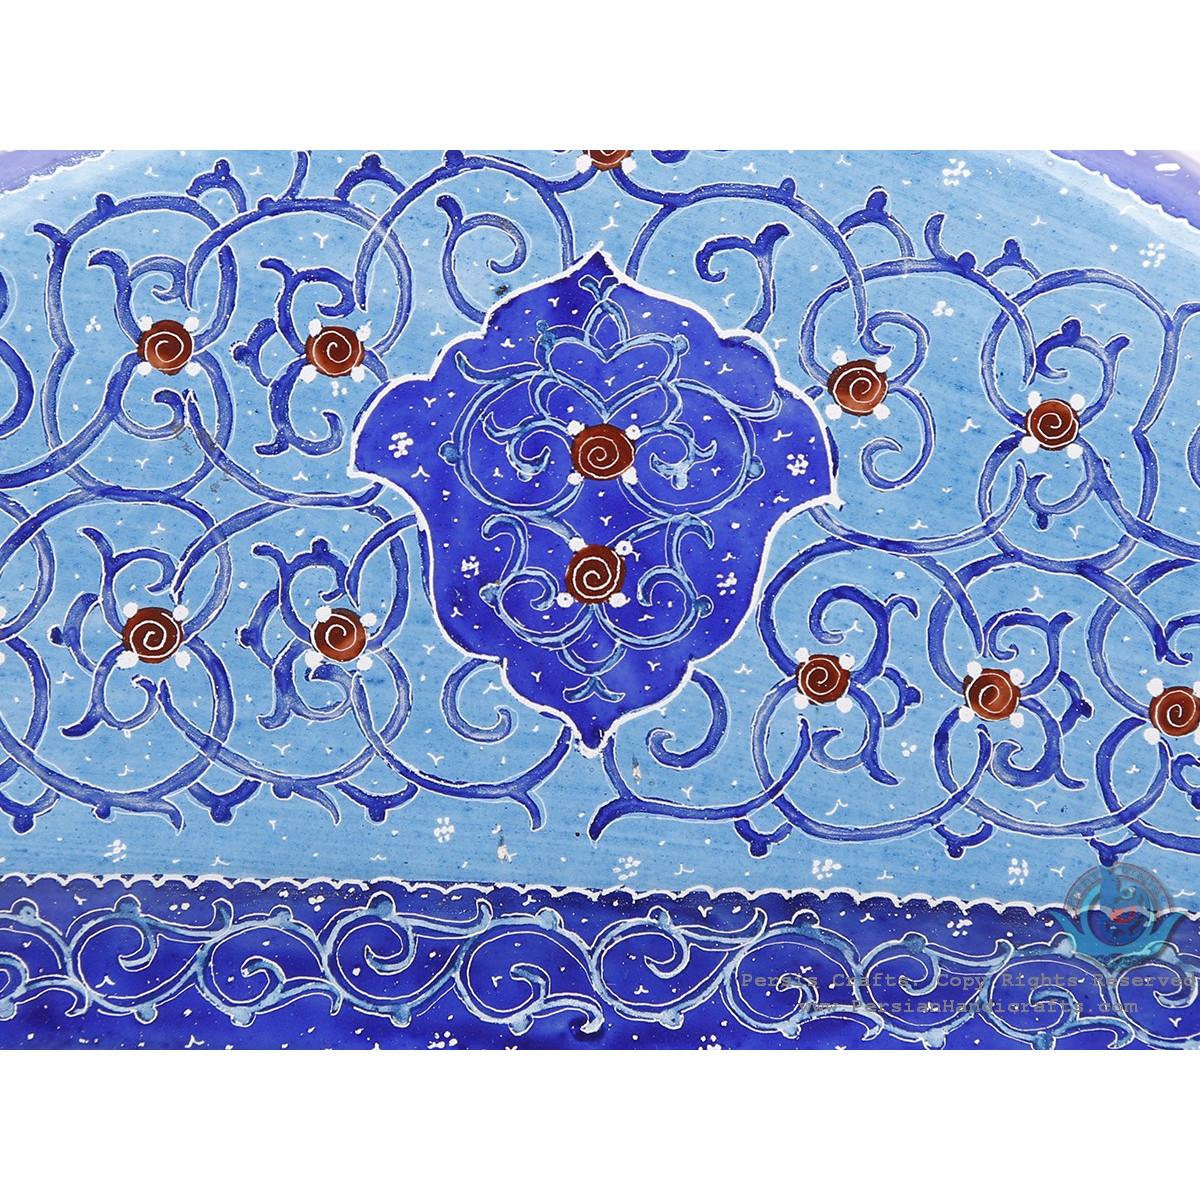 Classy Enamel Eslimi Design Minakari Wall Mirror - HE3920-Persian Handicrafts